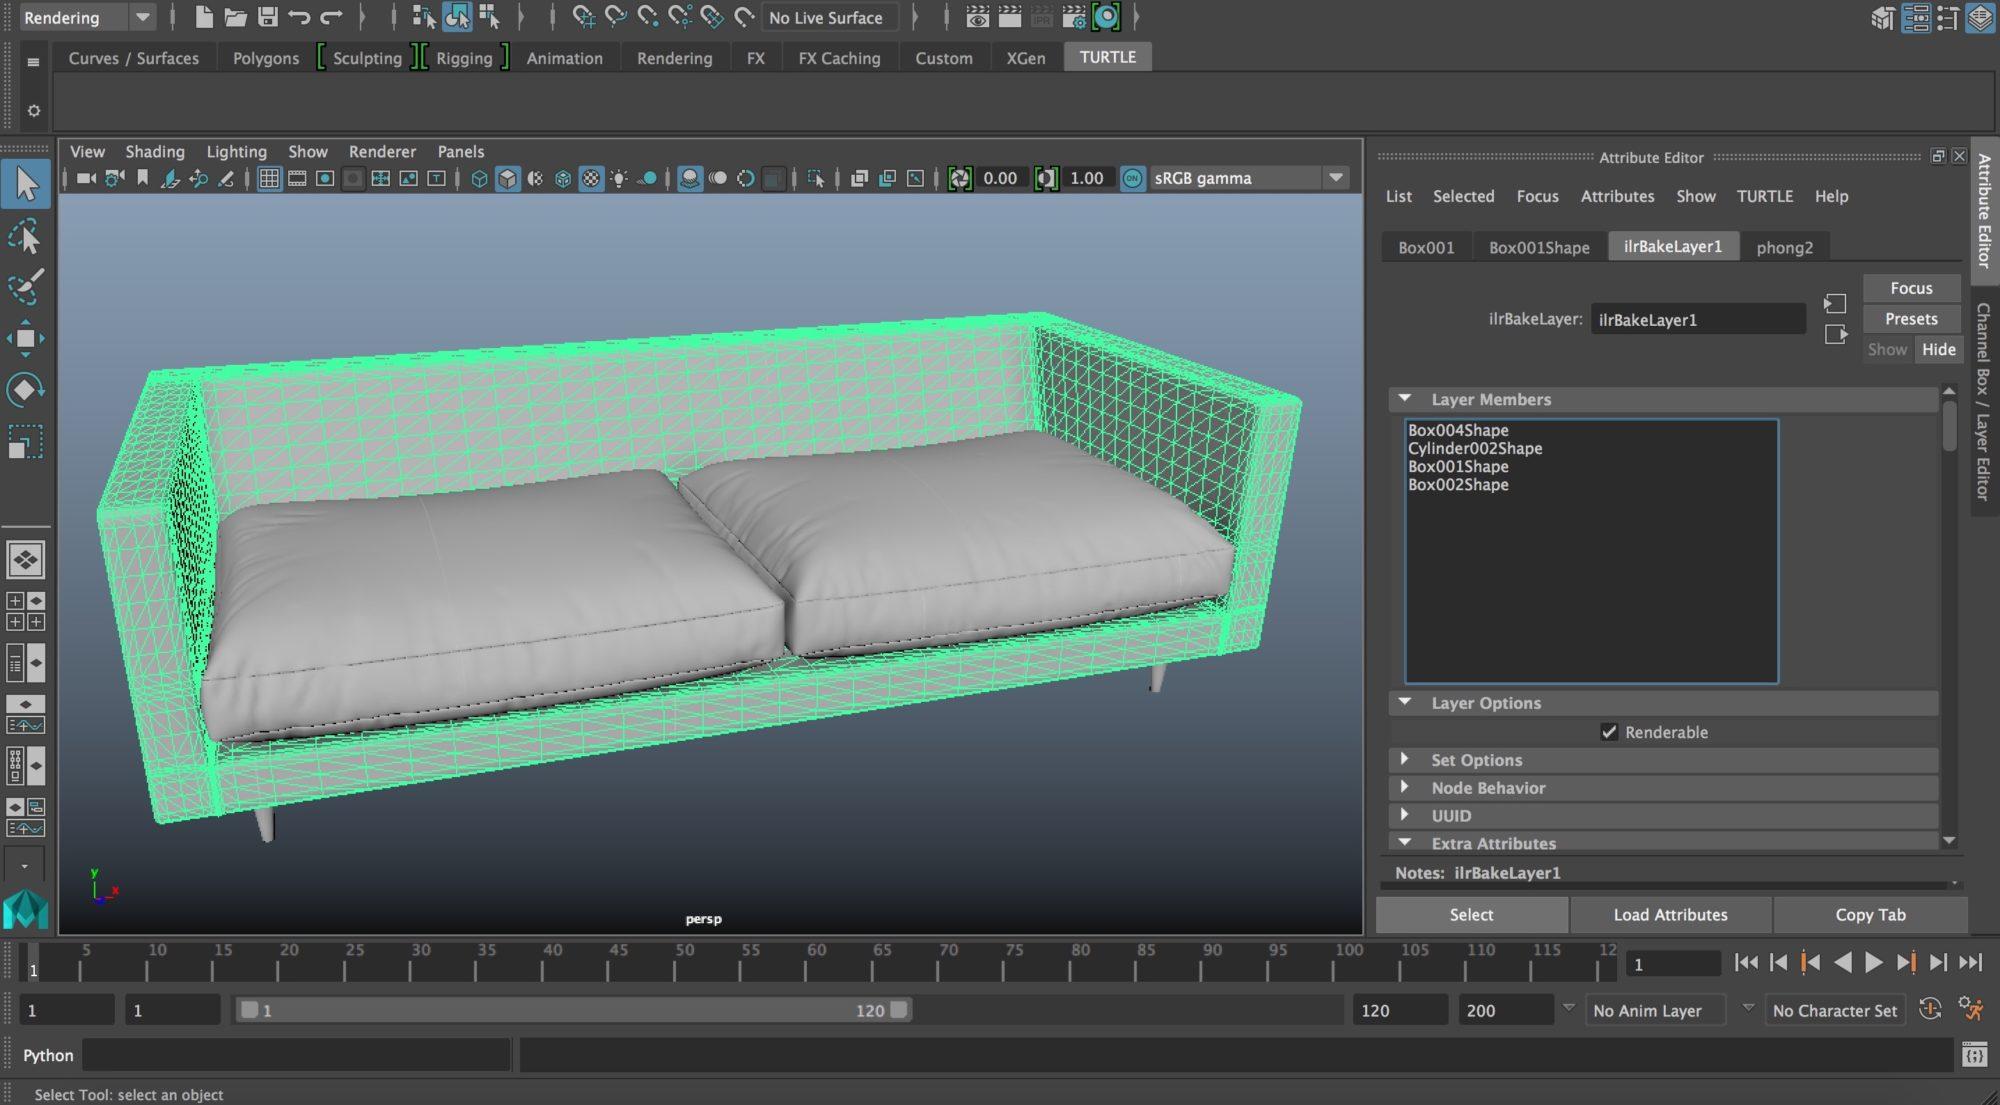 Autodesk Maya – Texture Baking (Ambient Occlusion)